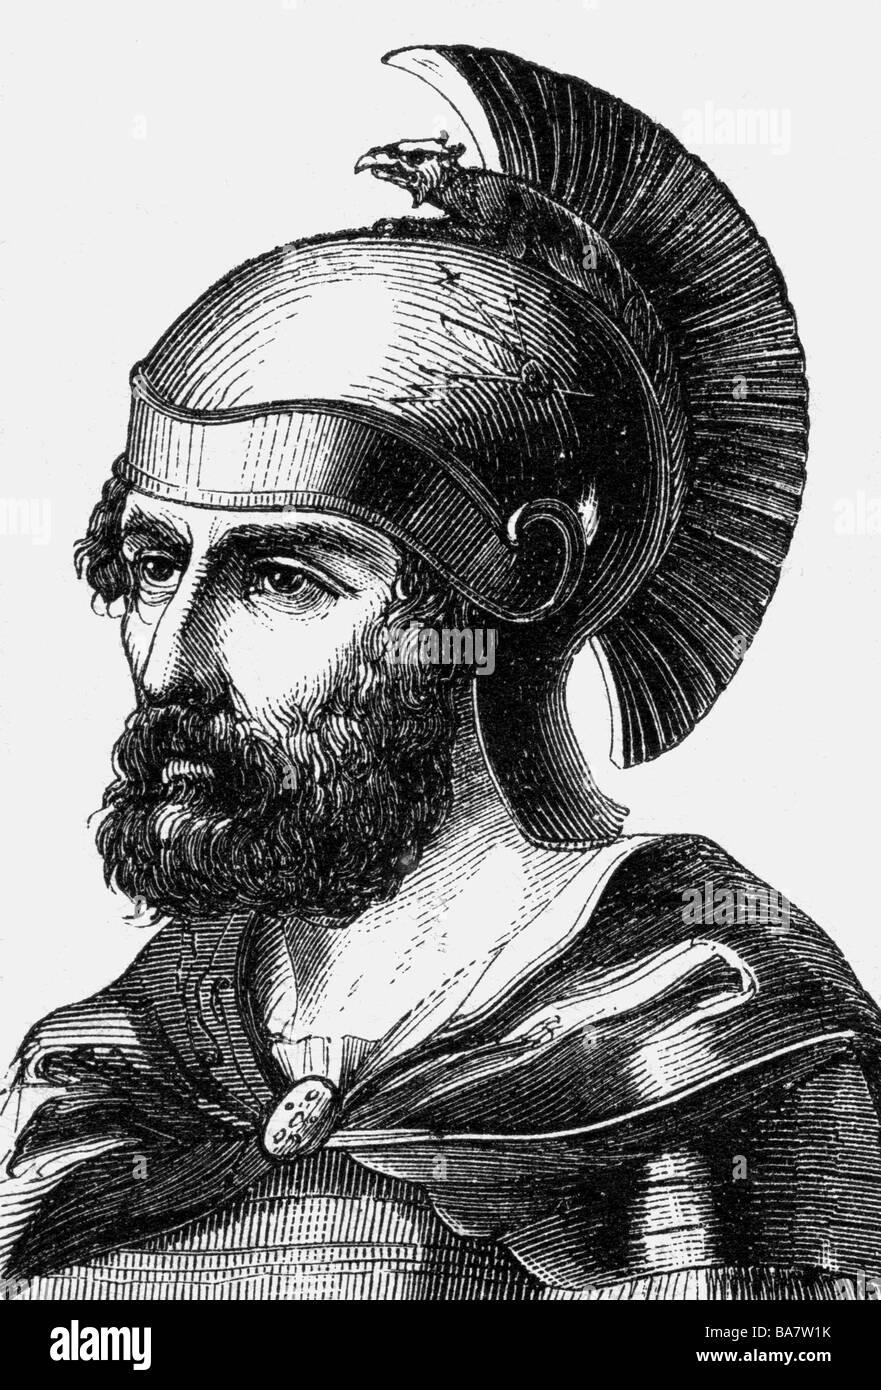 Hamilcar Barka, circa 270 - 229 BC, vChr. Carthaginian military leader, portrait, wood engraving, 19th century, - Stock Image